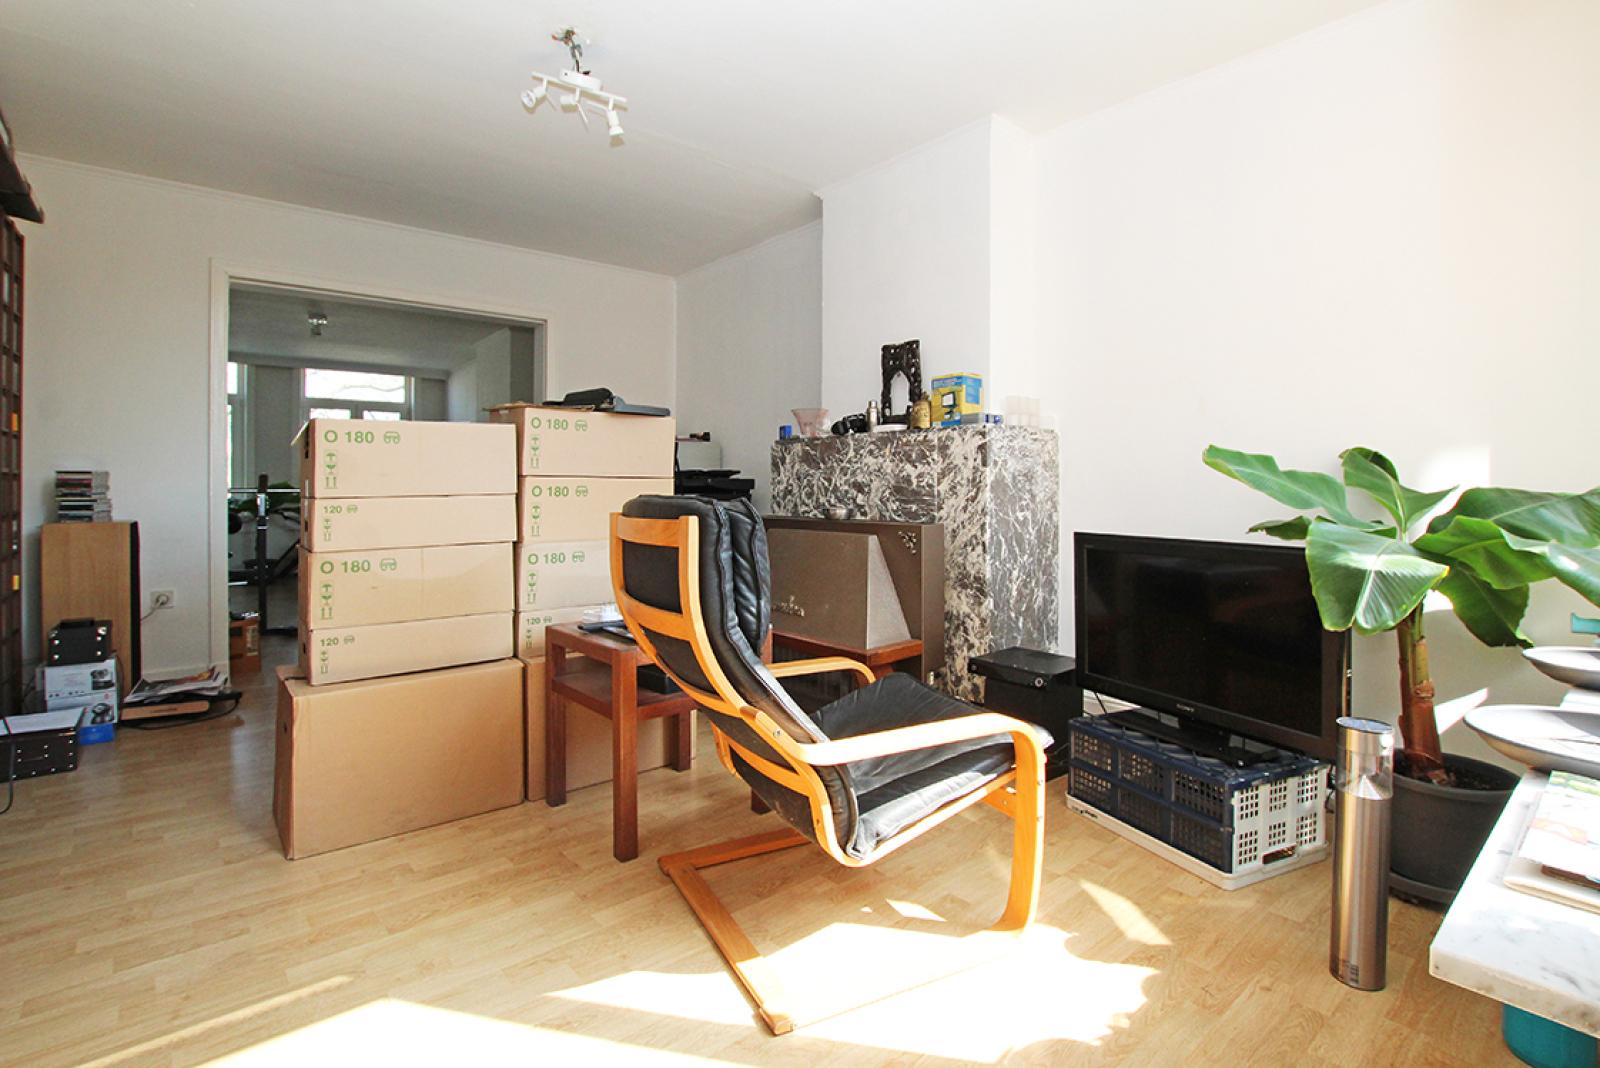 Charmant 2-slpk appartement op leuke locatie te Berchem! afbeelding 3